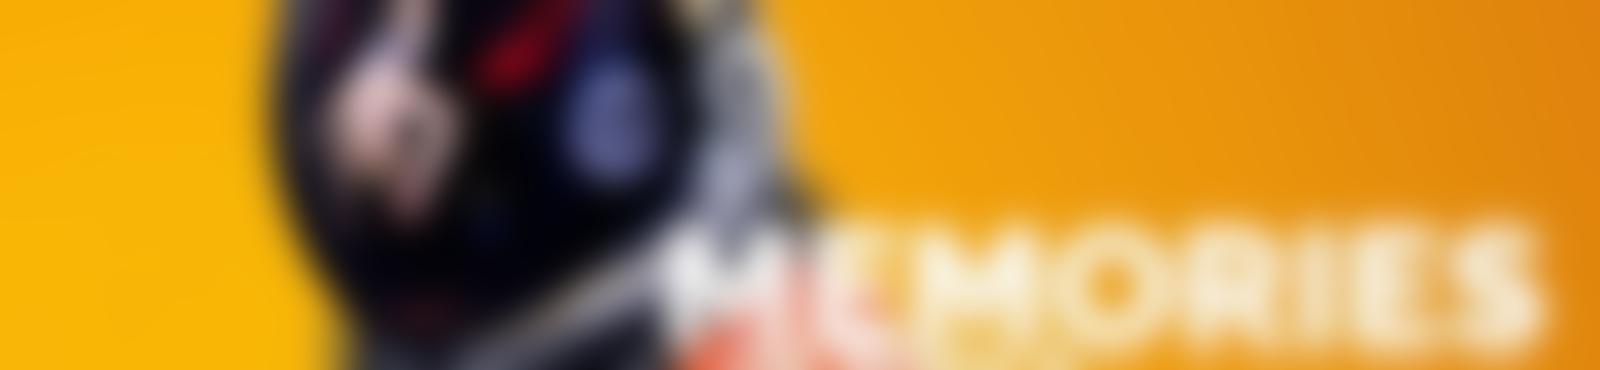 Blurred 82fb7a98 ccc5 46b2 a5e1 bfb82f4d40d1